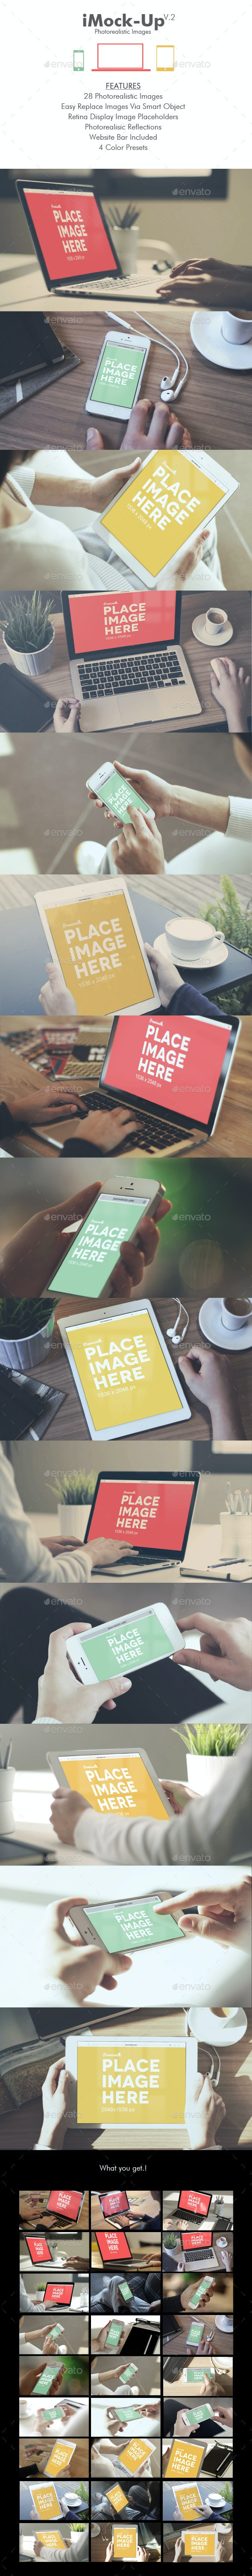 iMock-Up Photorealistic Images - Displays Product Mock-Ups